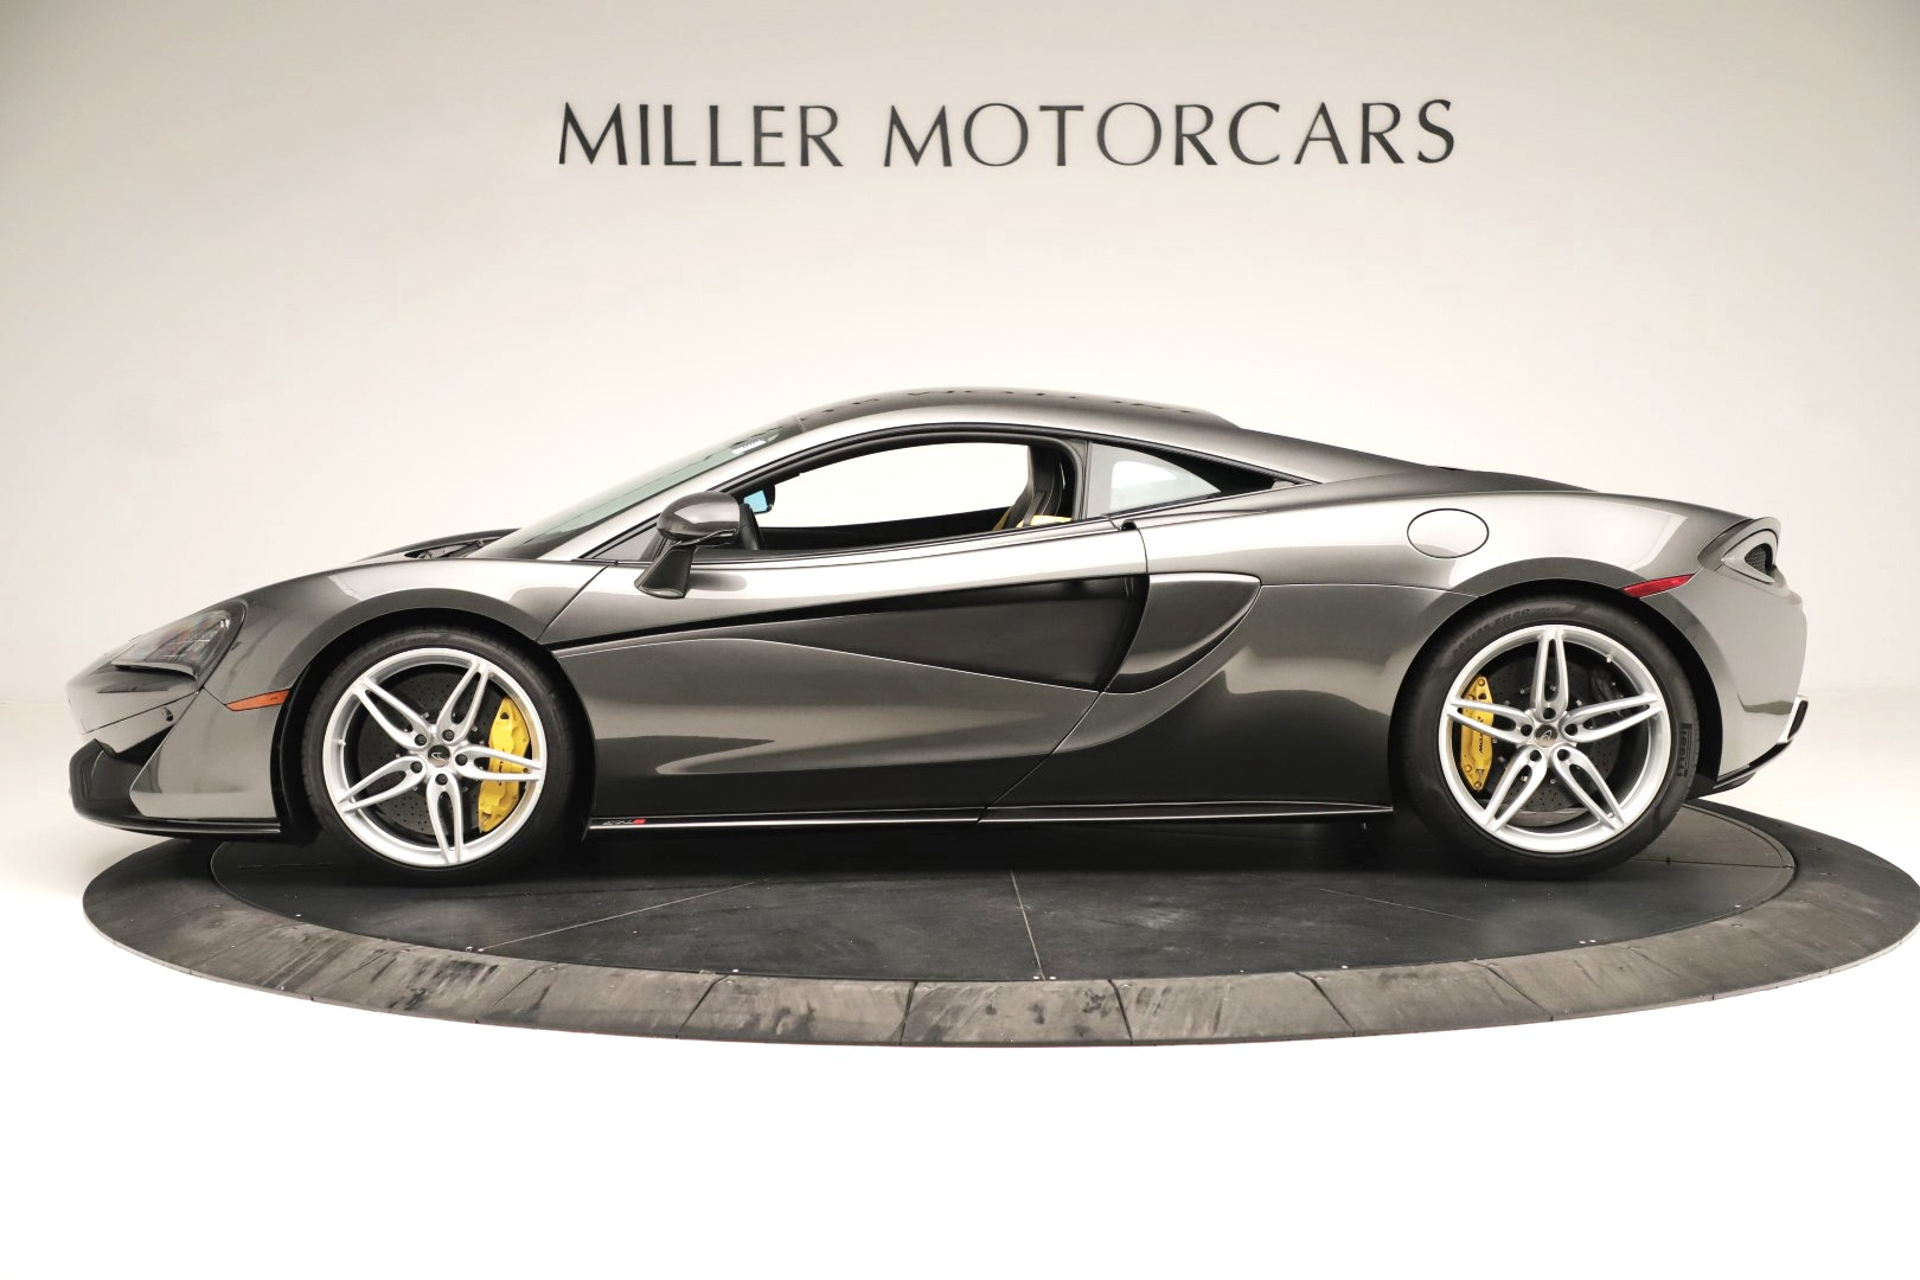 Used 2017 McLaren 570S Coupe For Sale In Westport, CT 3361_p2